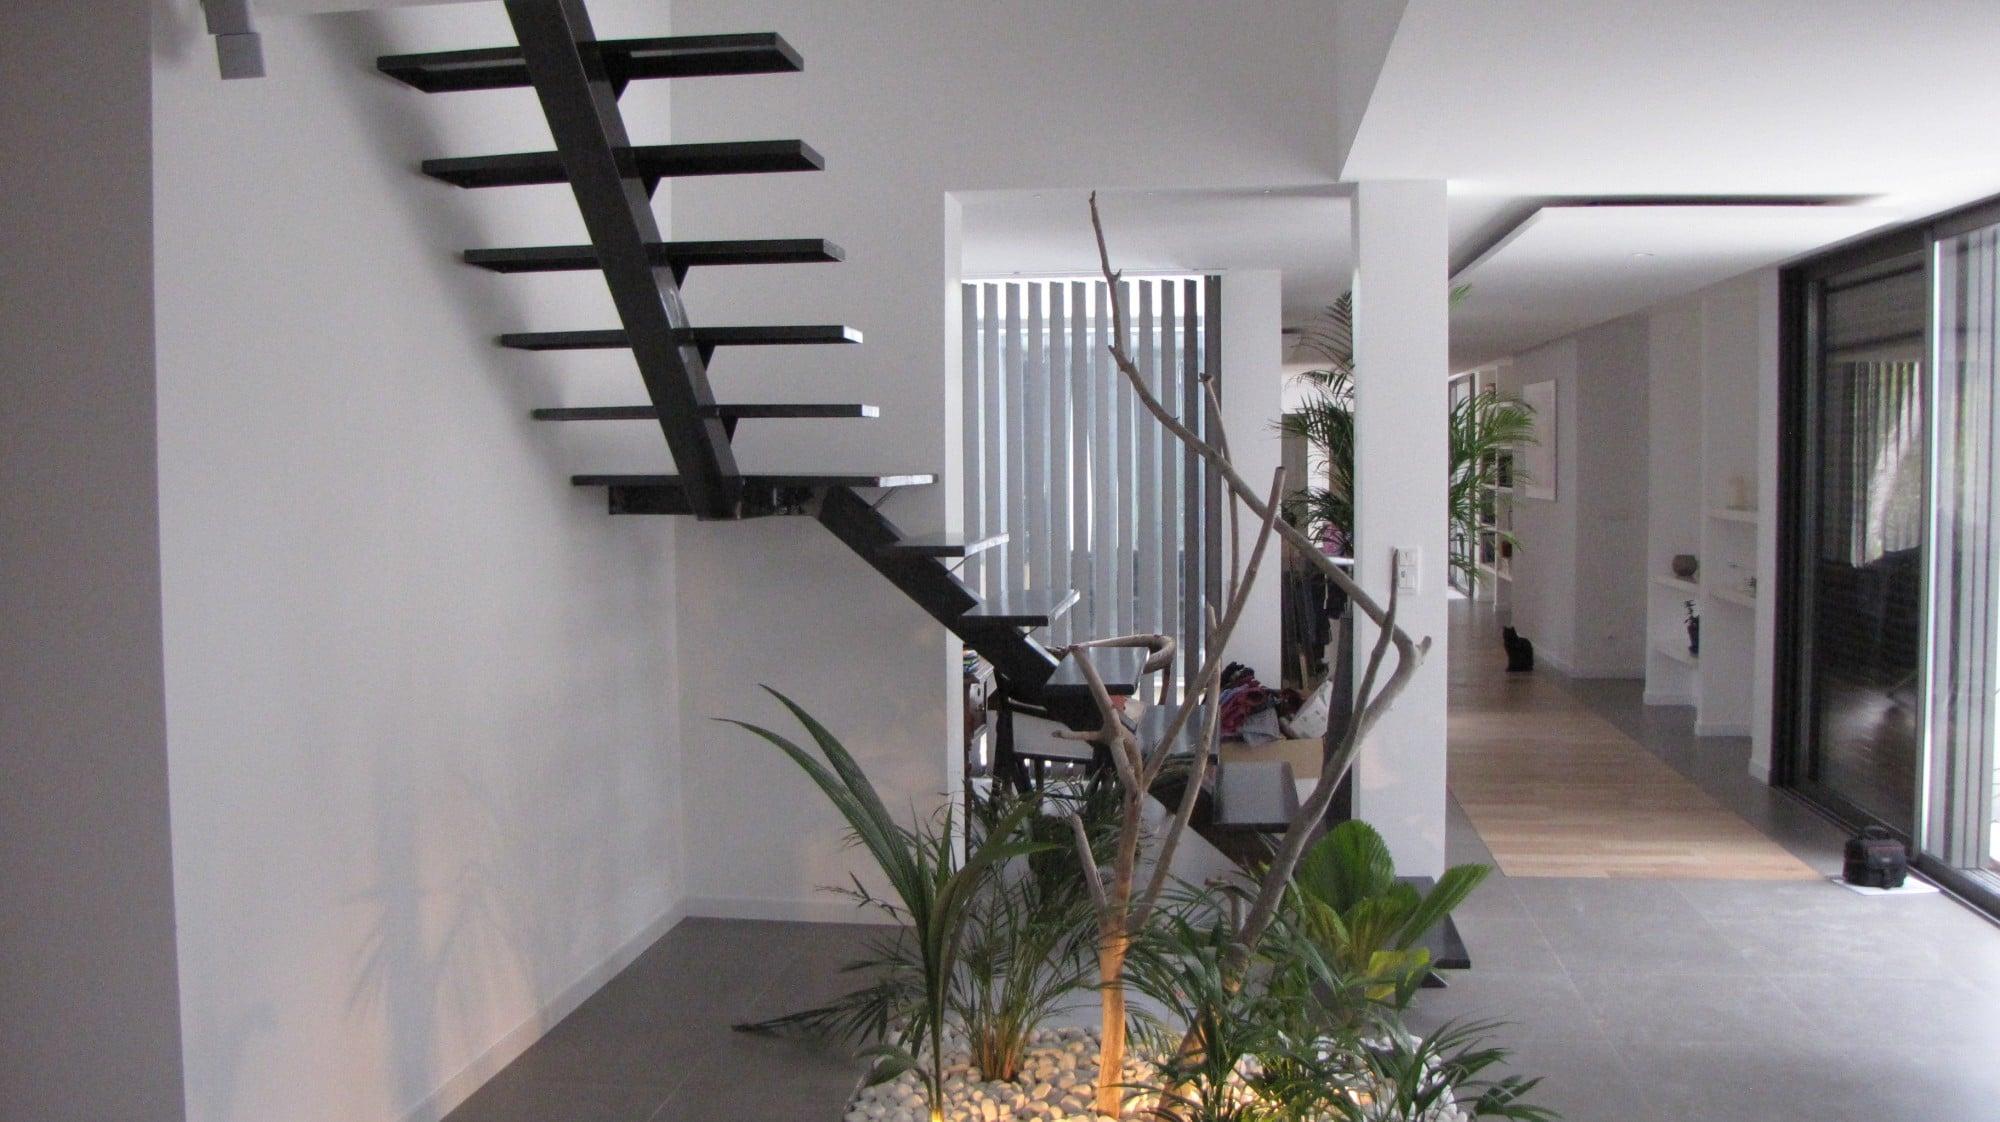 escalier tournant limon central escalier jacoby. Black Bedroom Furniture Sets. Home Design Ideas